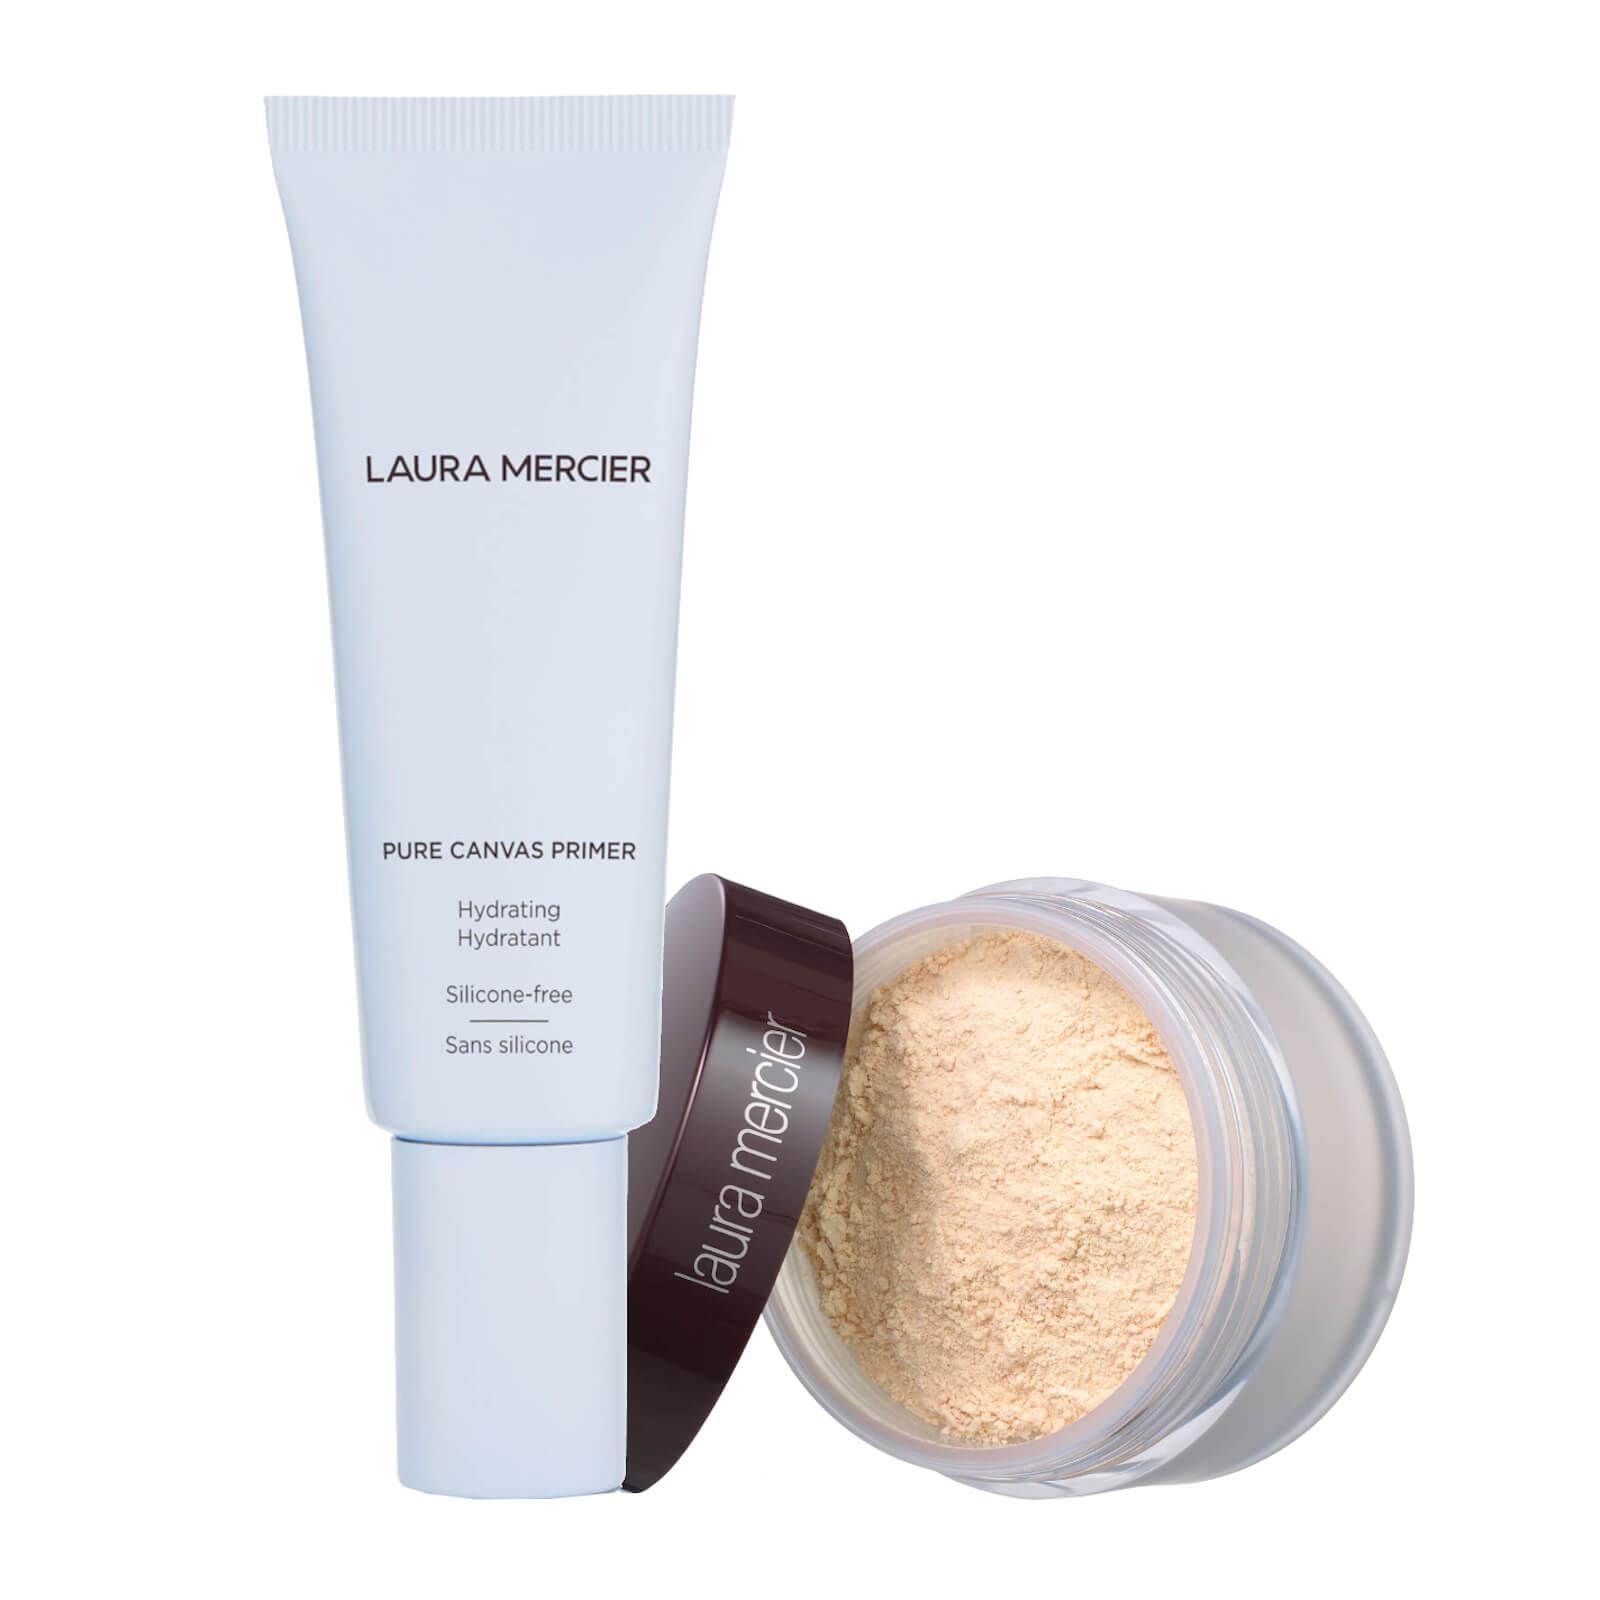 Laura Mercier Pure Canvas Primer Hydrating & Translucent Loose Setting Powder (Various Shades) - Translucent